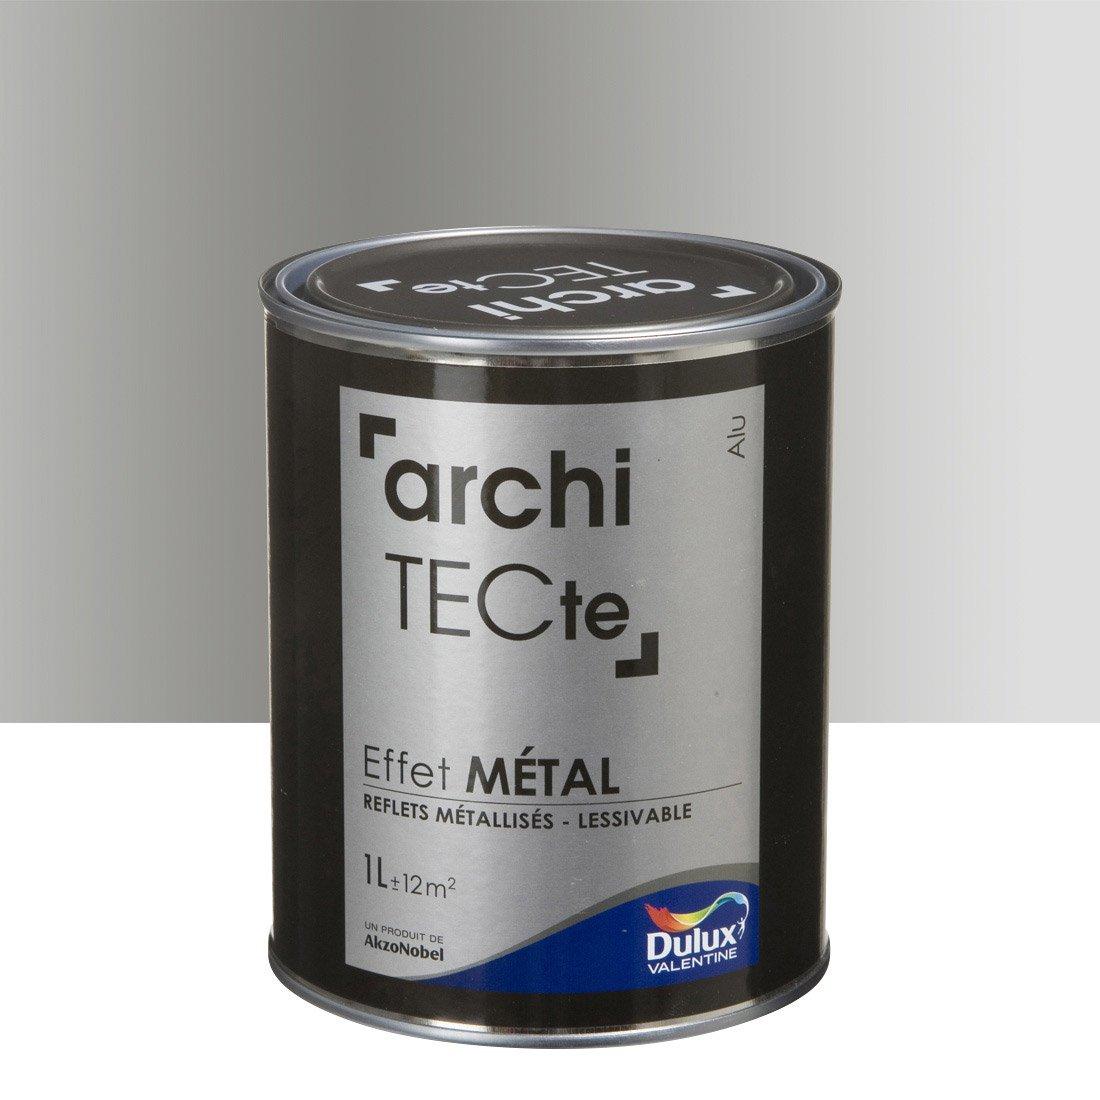 peinture effet architecte effet m tal dulux valentine gris aluminium 1 l leroy merlin. Black Bedroom Furniture Sets. Home Design Ideas